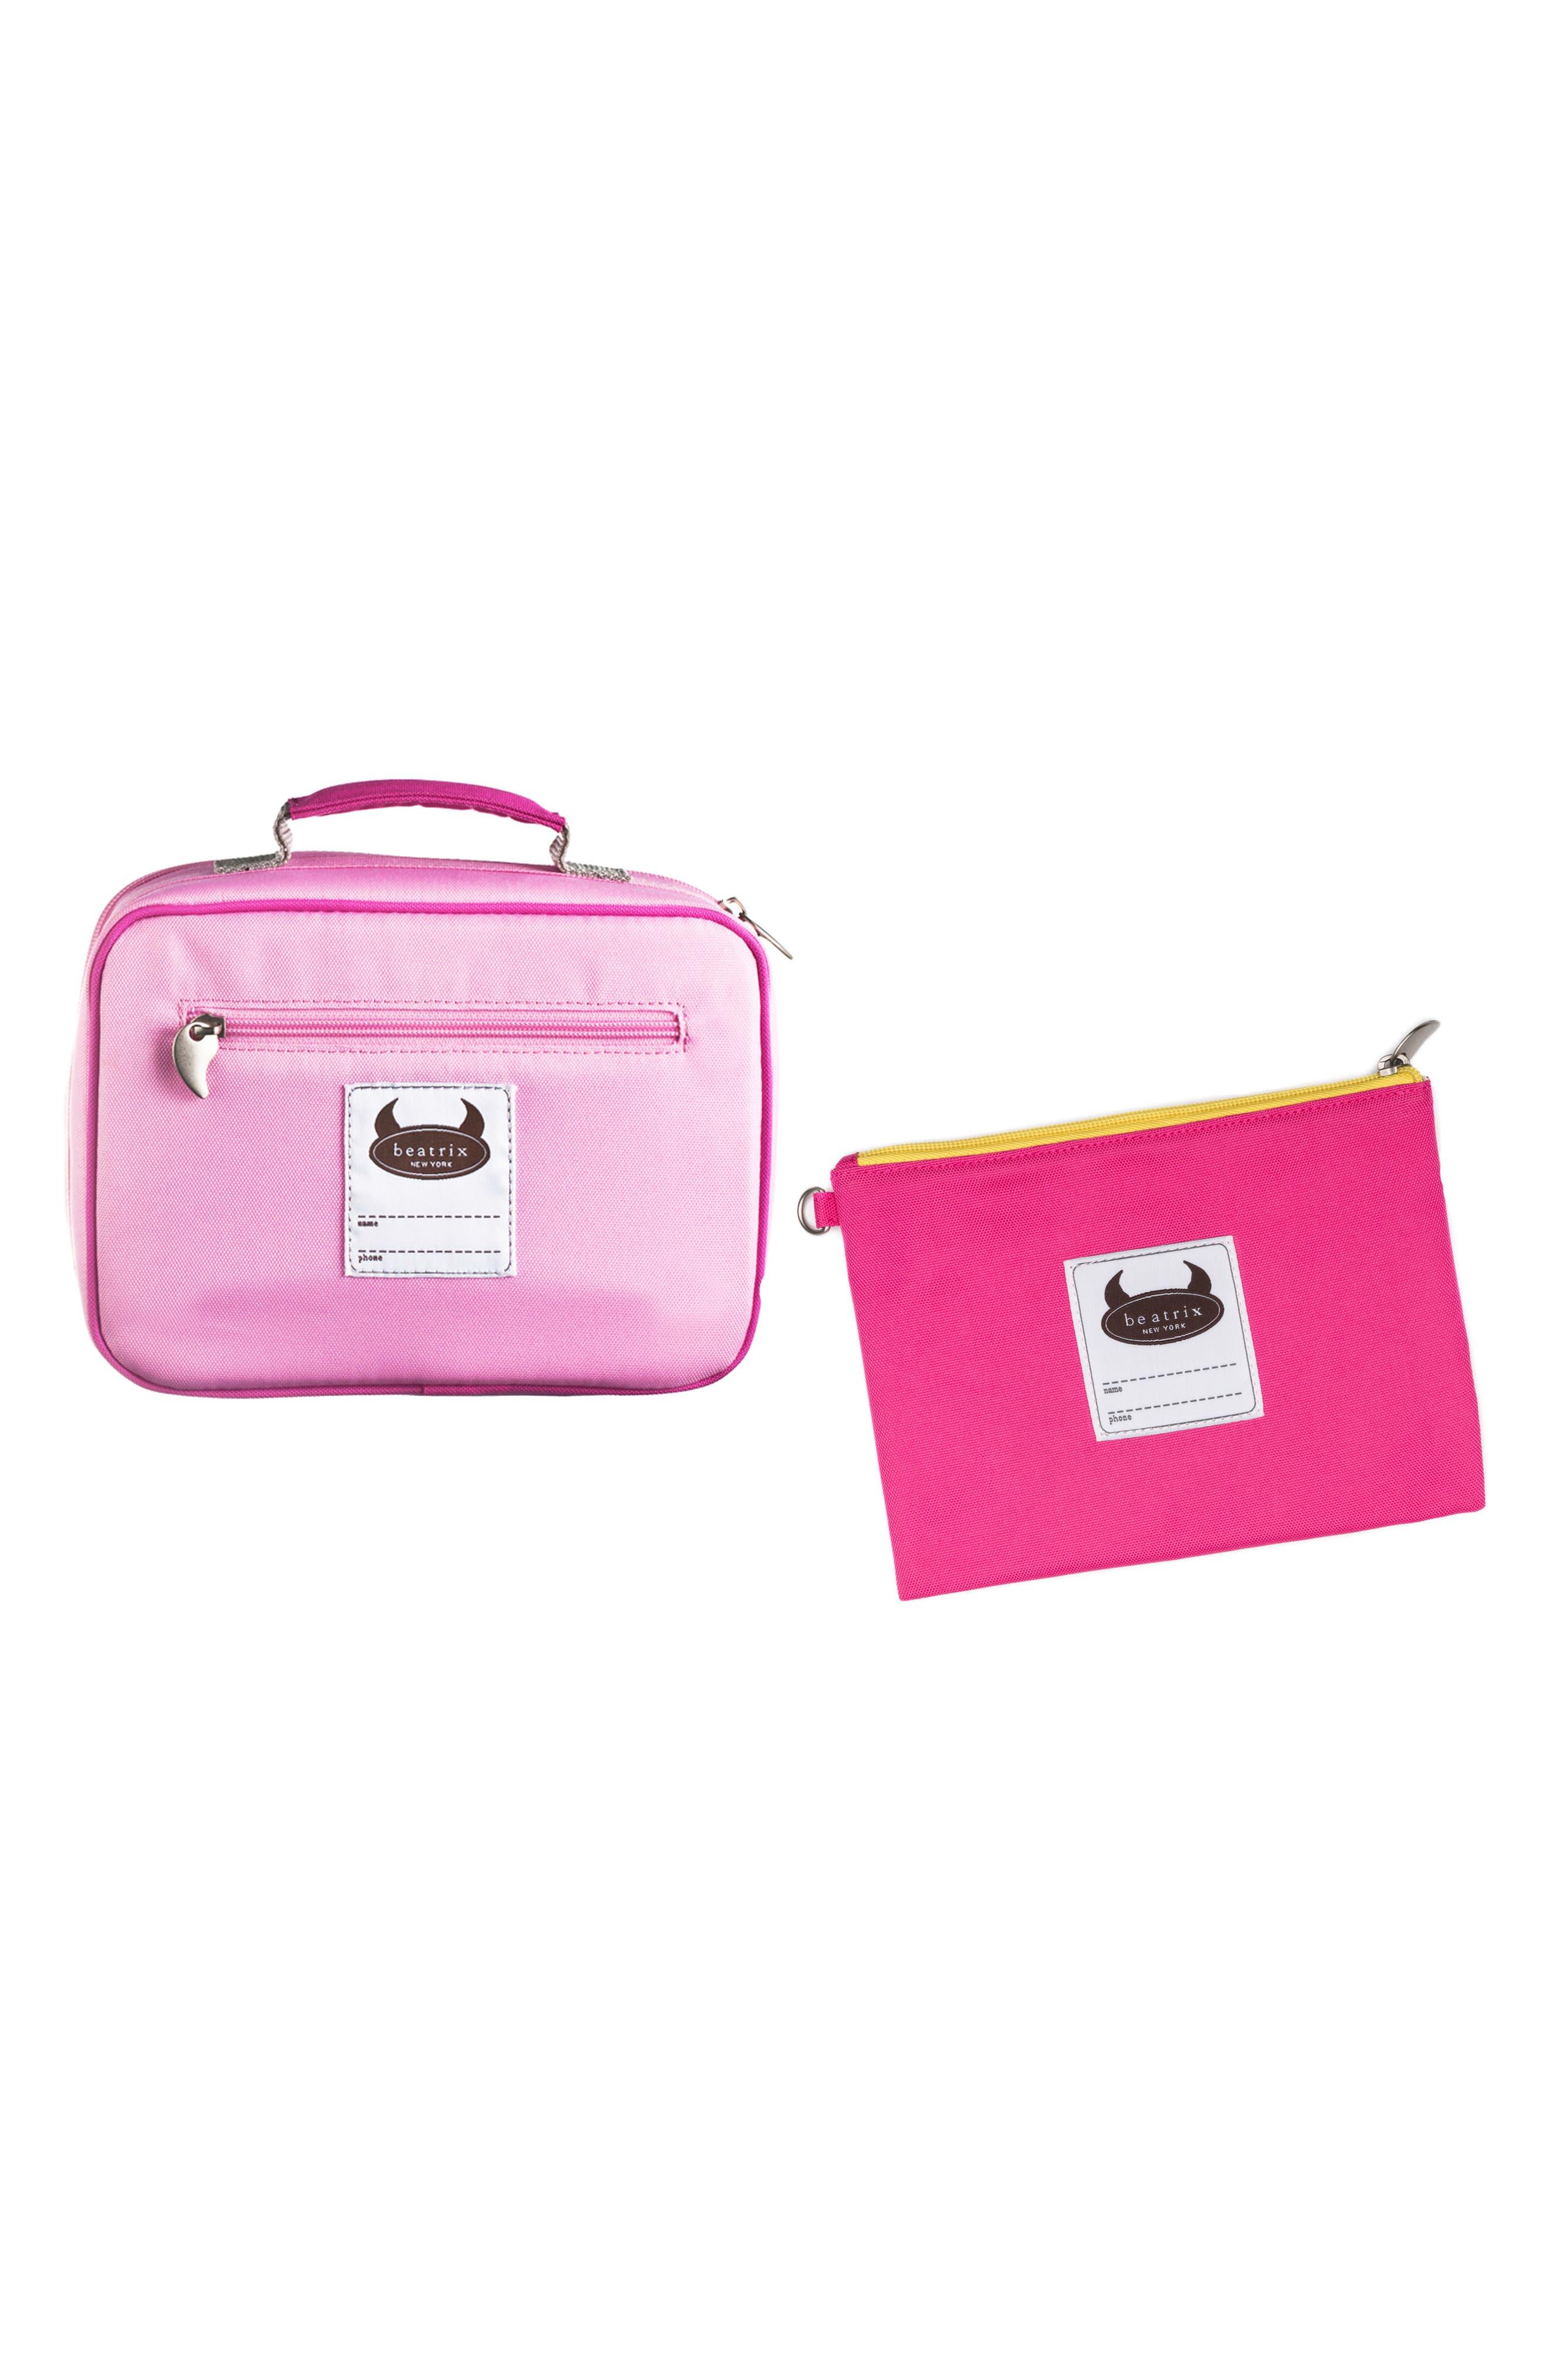 Lunch Box & Travel Pouch Set,                             Alternate thumbnail 10, color,